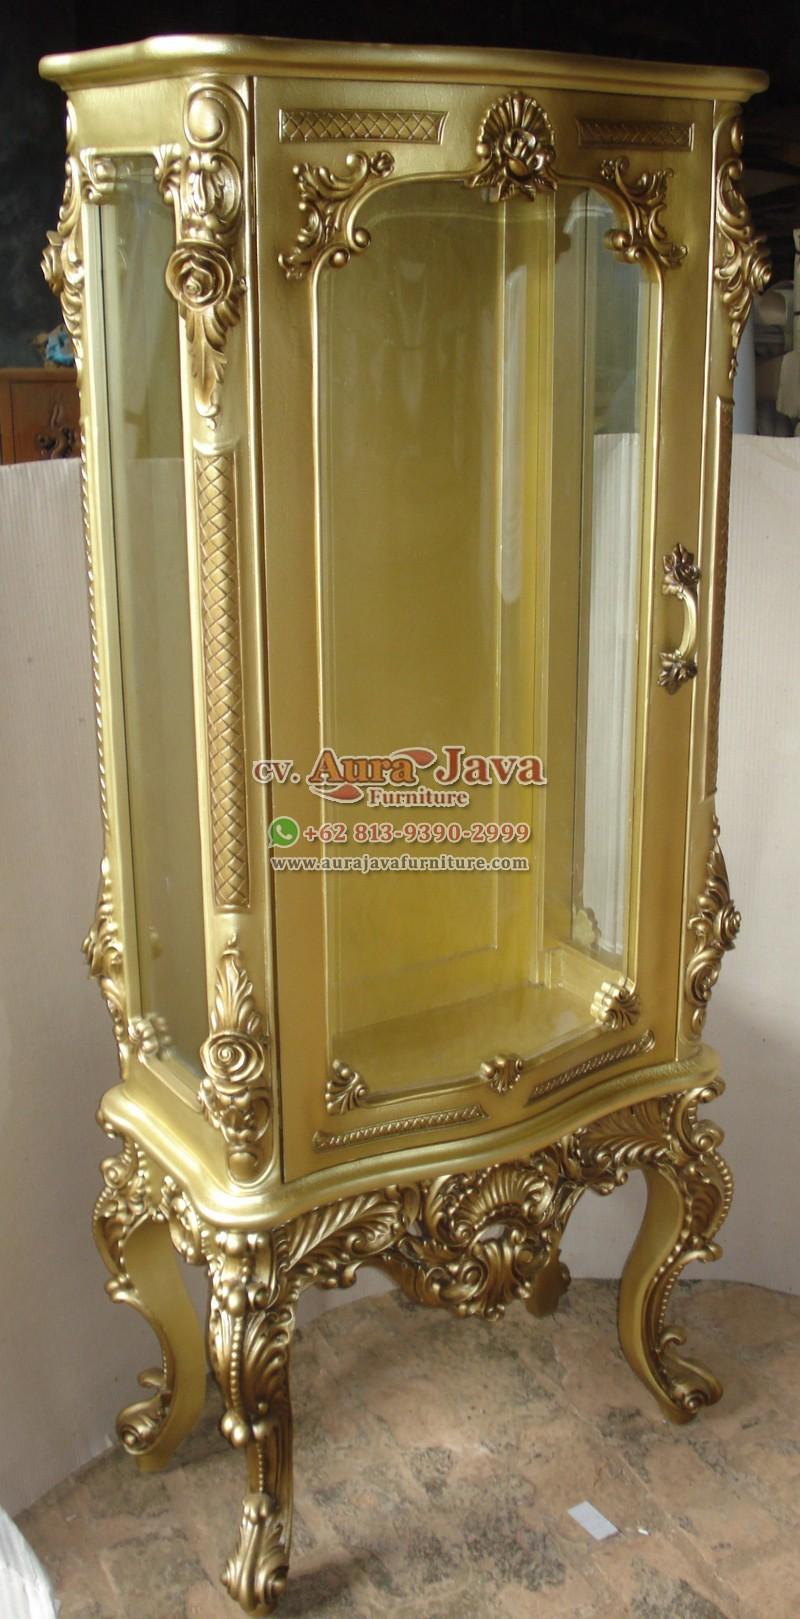 indonesia-matching-ranges-furniture-store-catalogue-book-case-aura-java-jepara_015